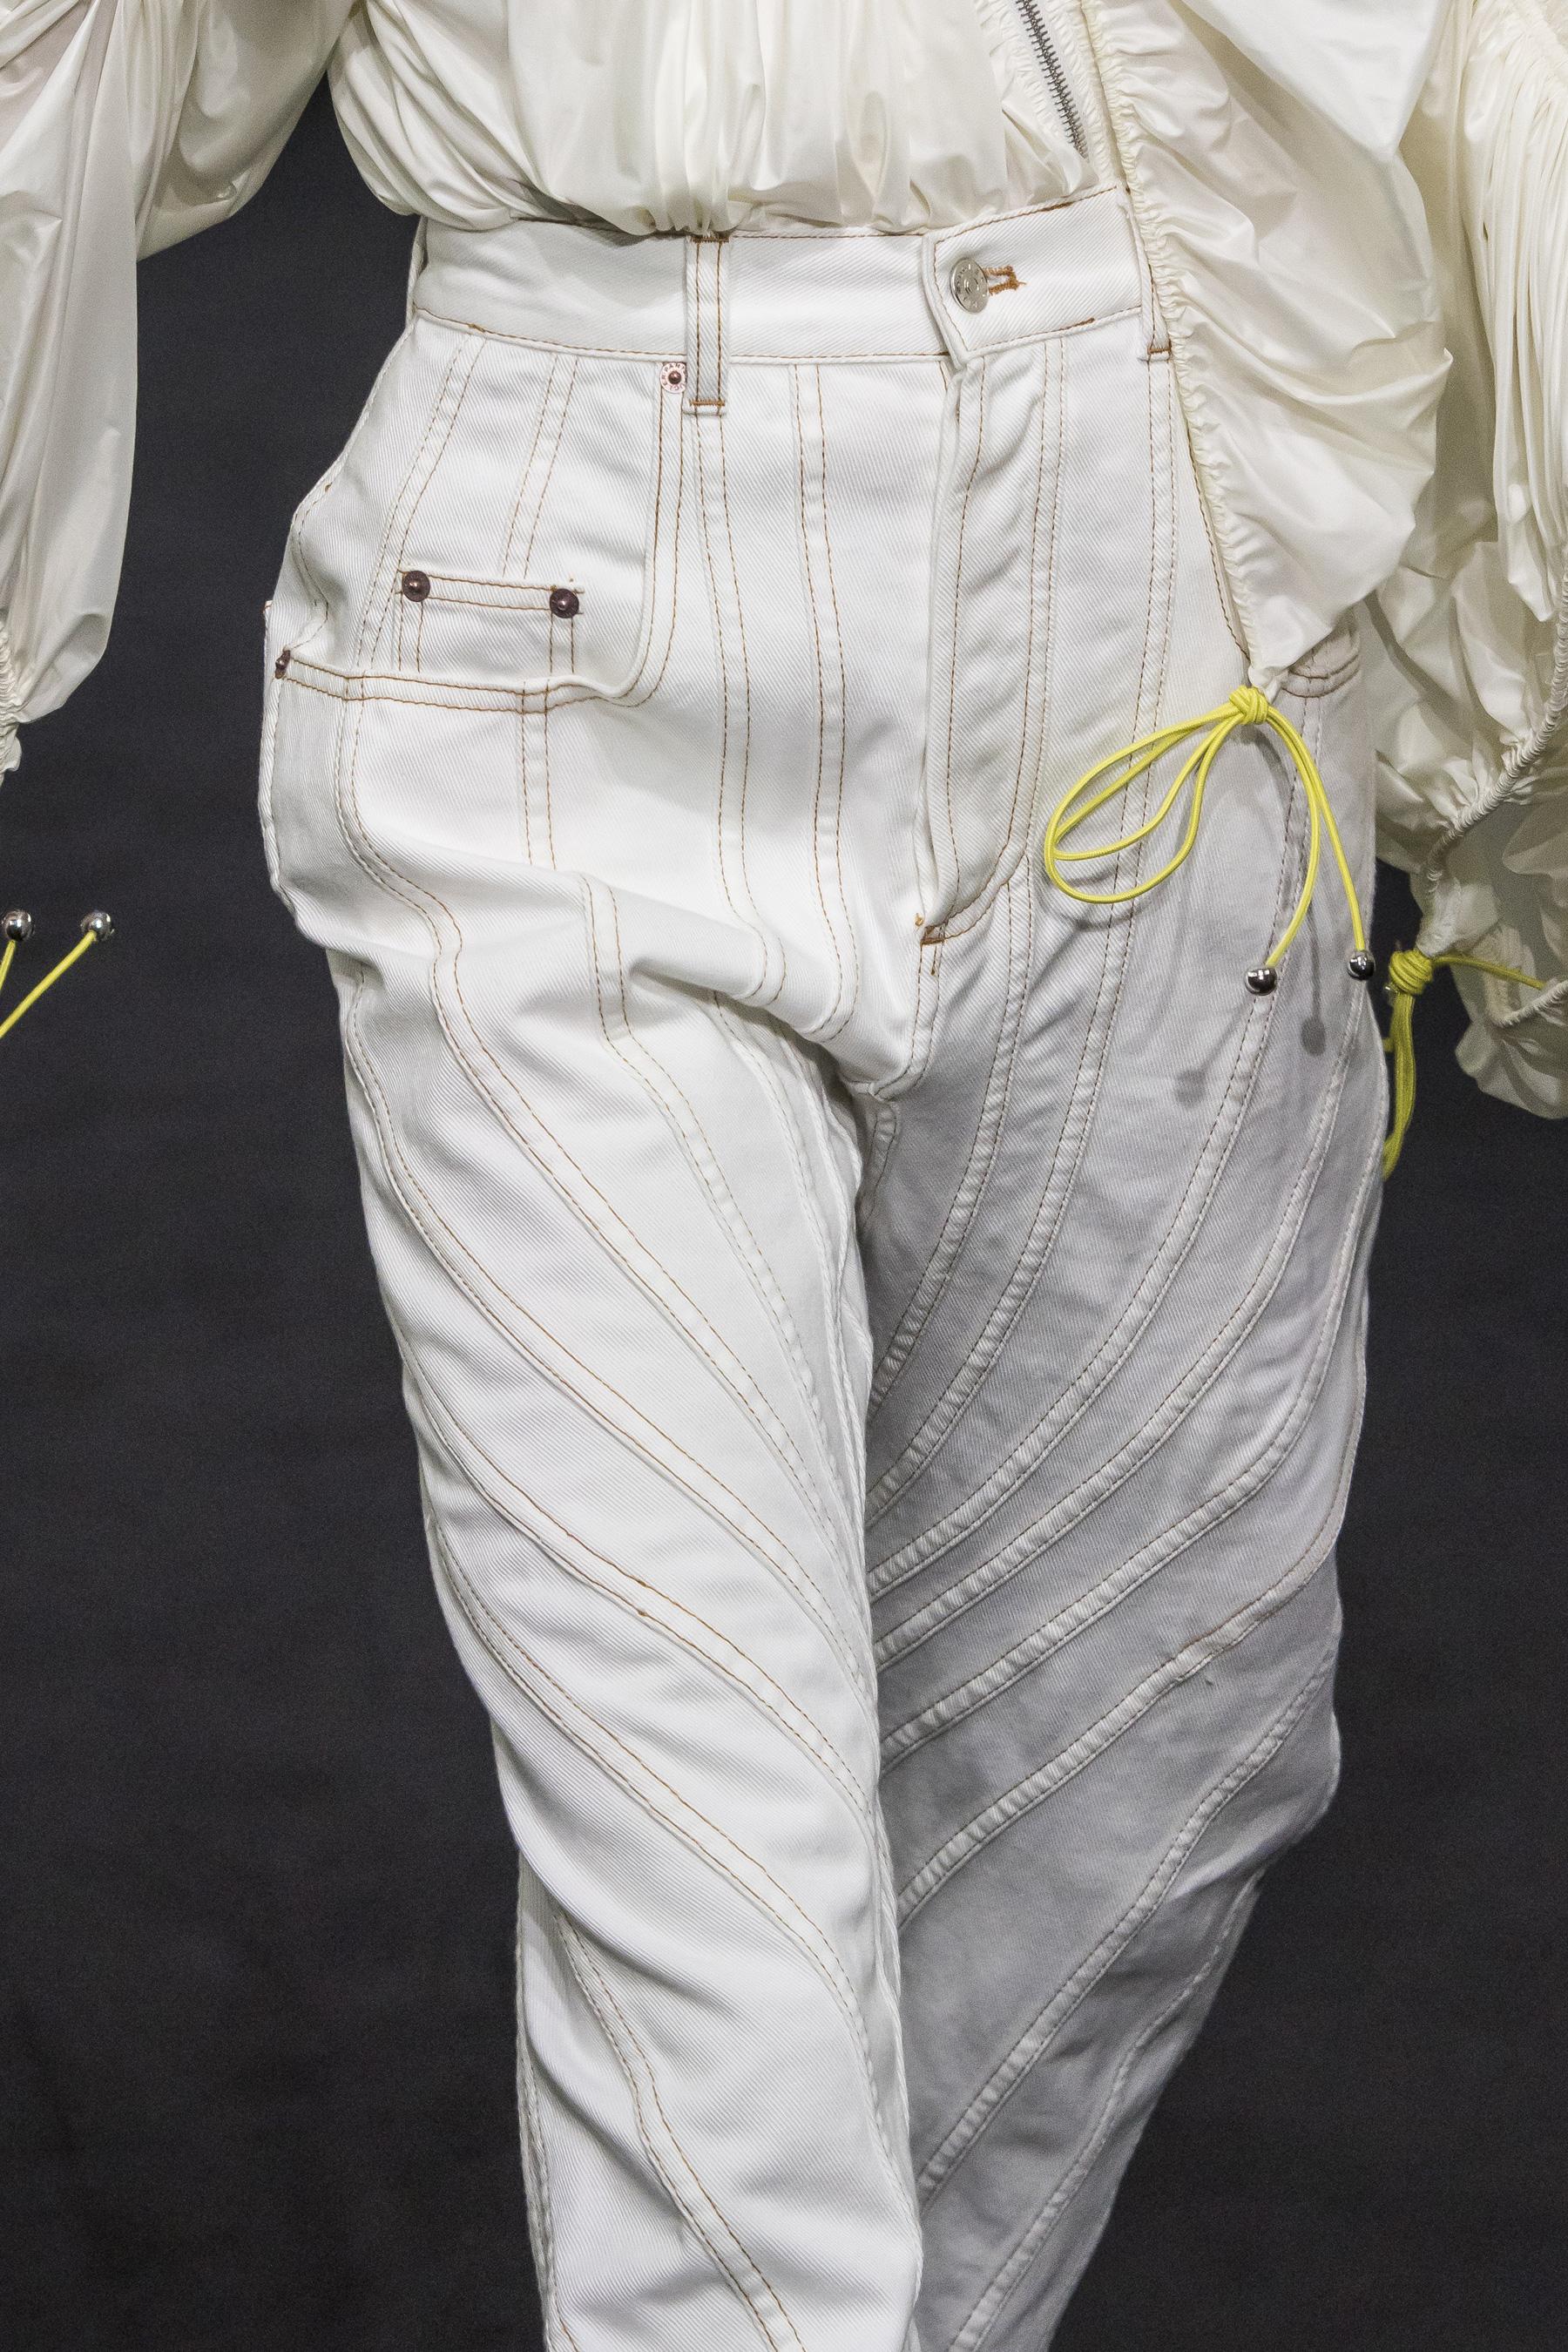 Mugler Details High Waisted Stitch Detail Boyfriend Fit Jeans Parachute Drawstring Taffeta Jacket in White Spring 19